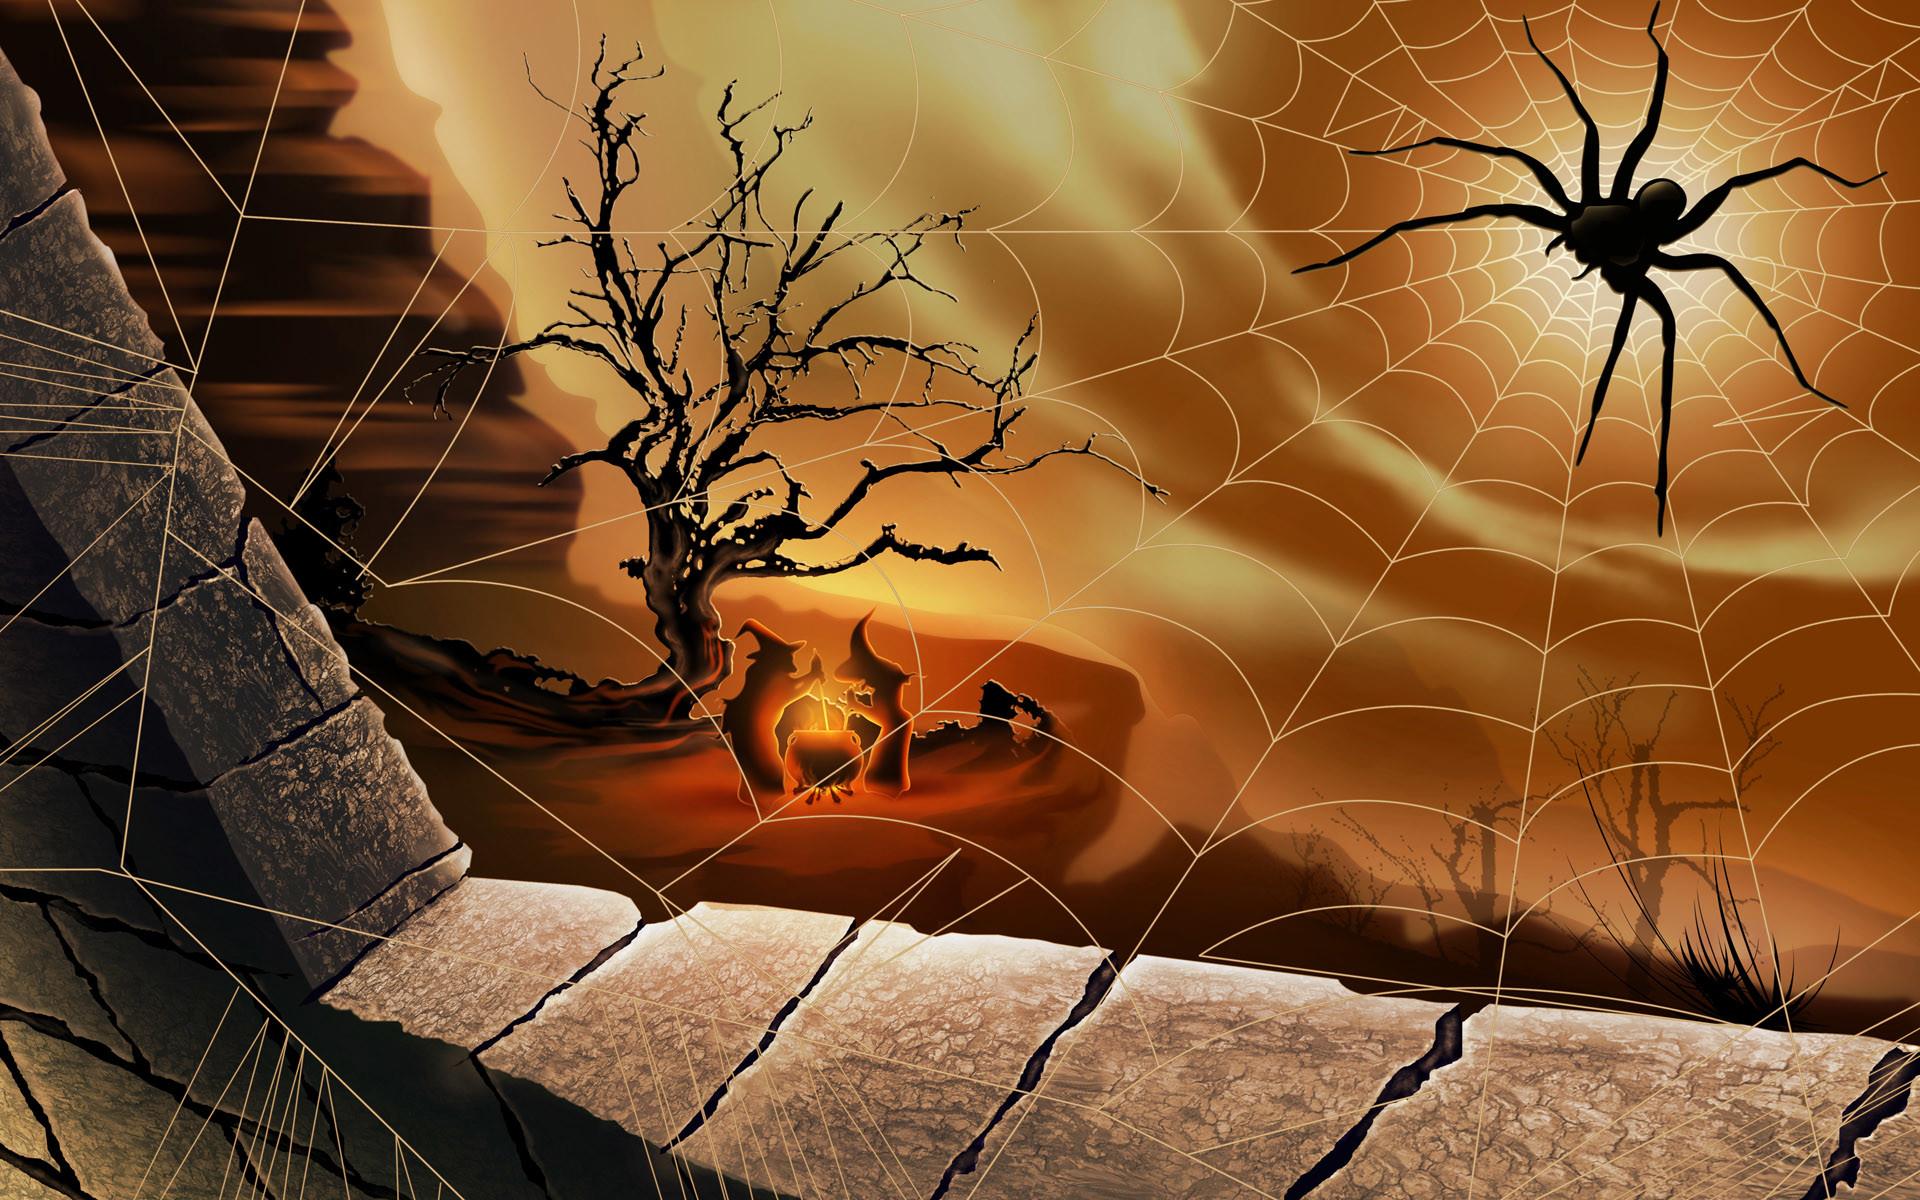 Black spider – halloween wallpaper